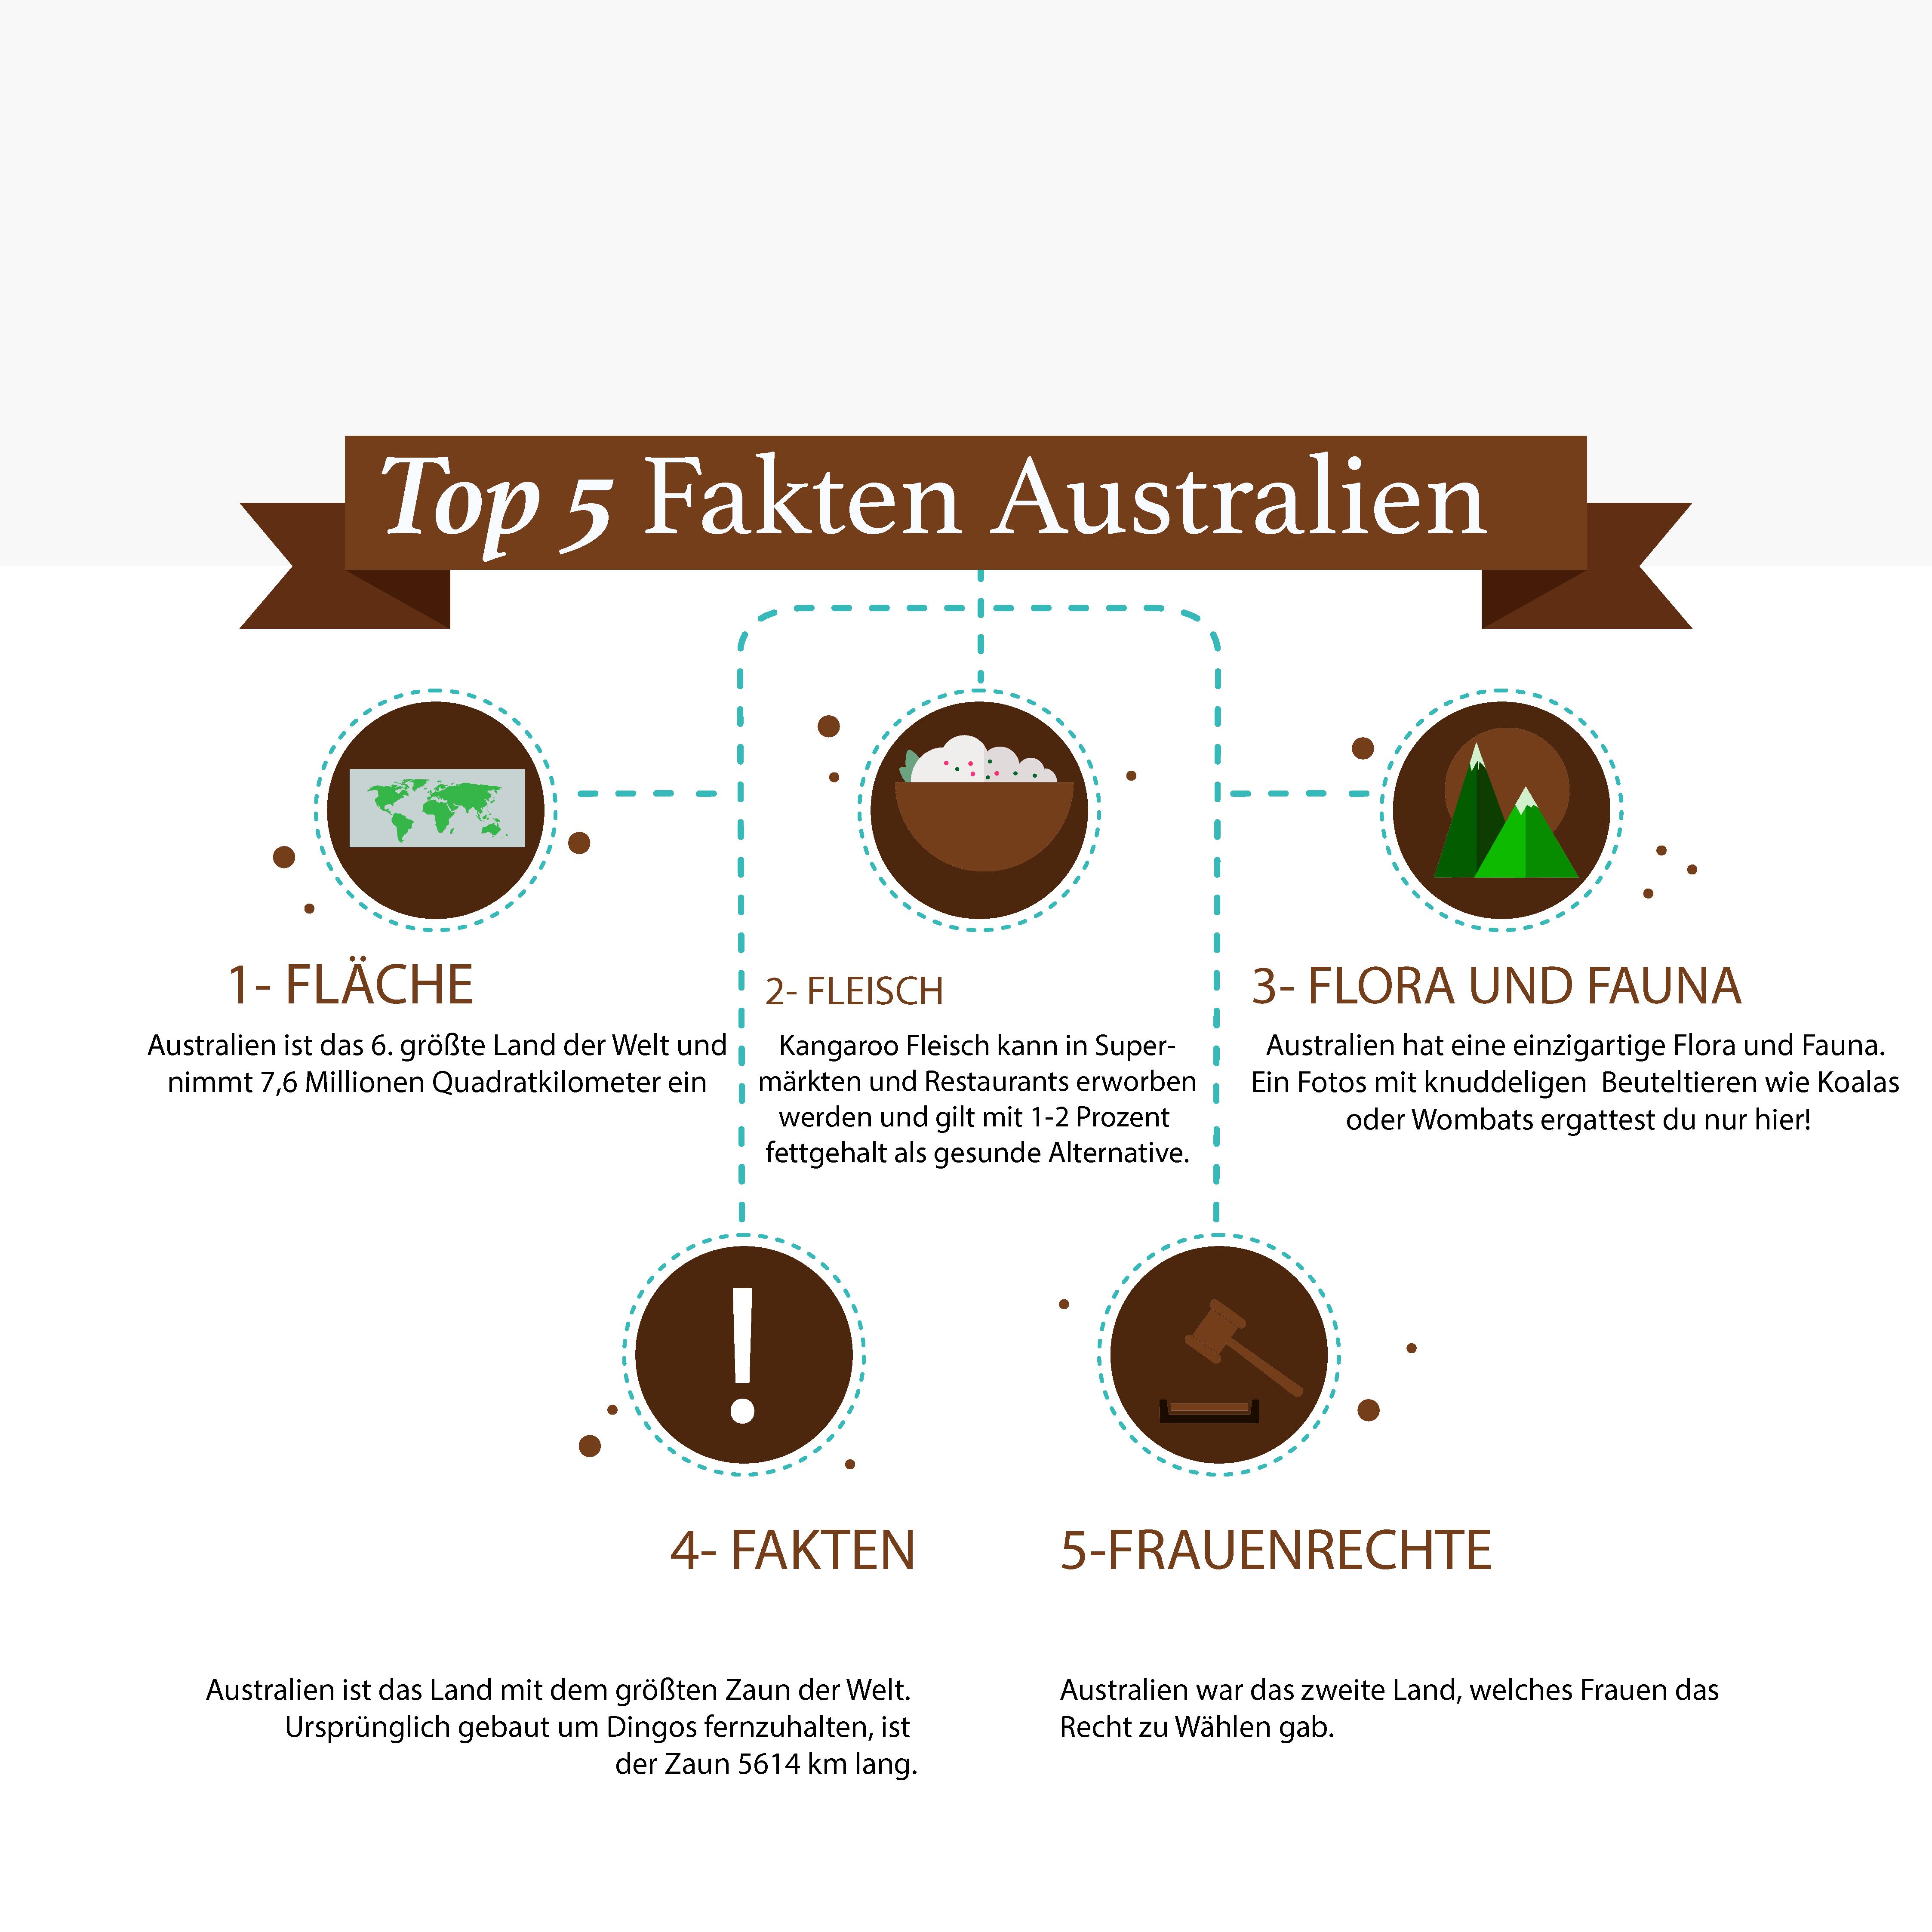 Top 5 Fakten Australien